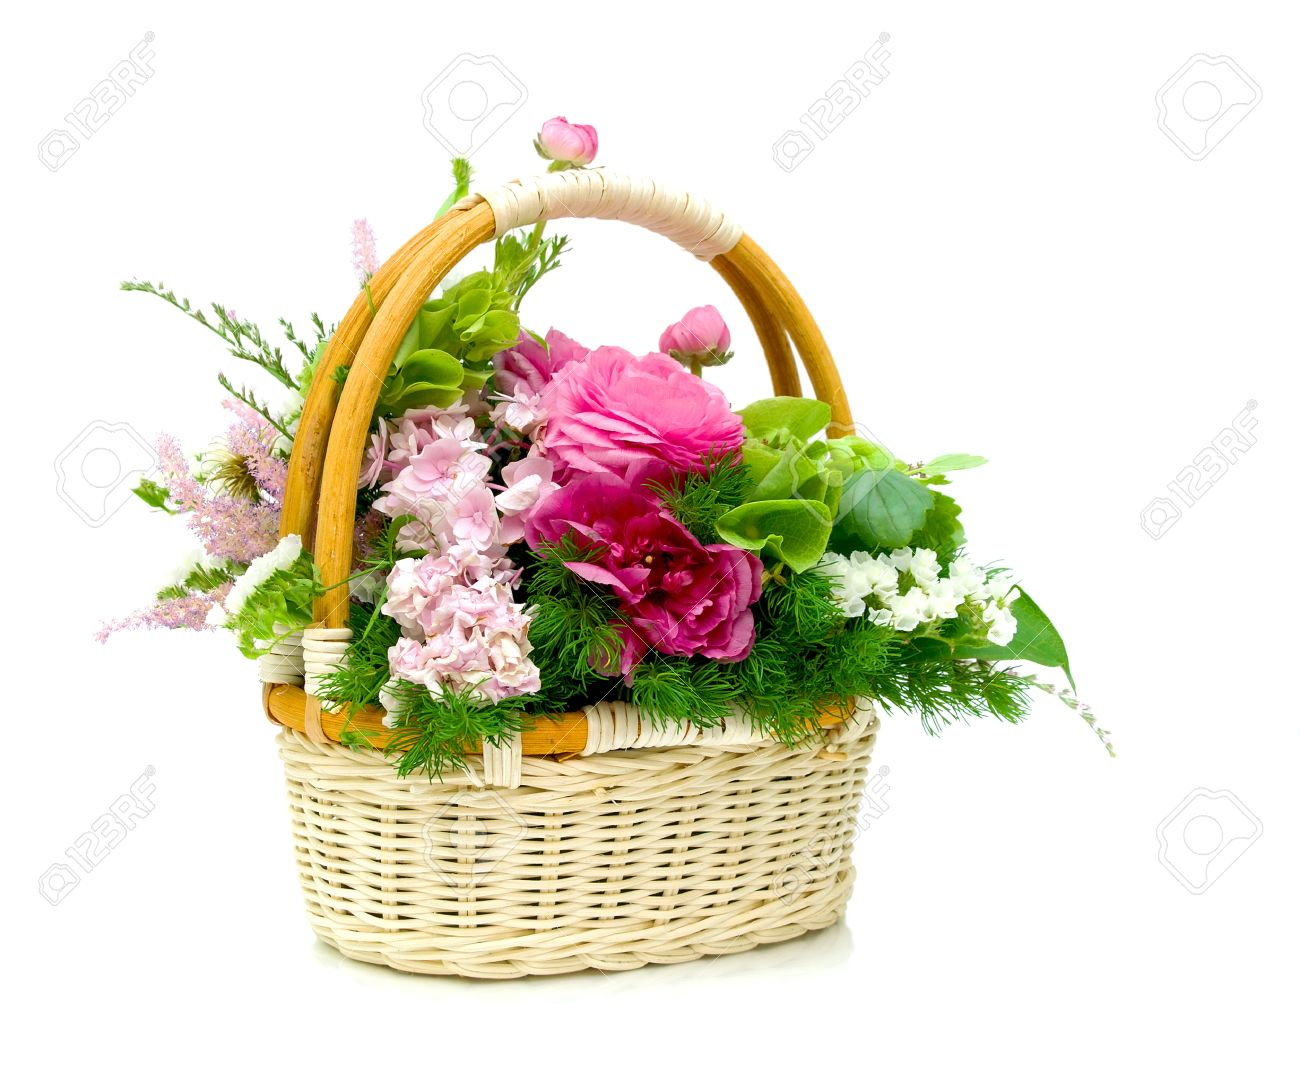 Wicker basket with fresh beautiful flowers isolated on white stock stock photo wicker basket with fresh beautiful flowers isolated on white background izmirmasajfo